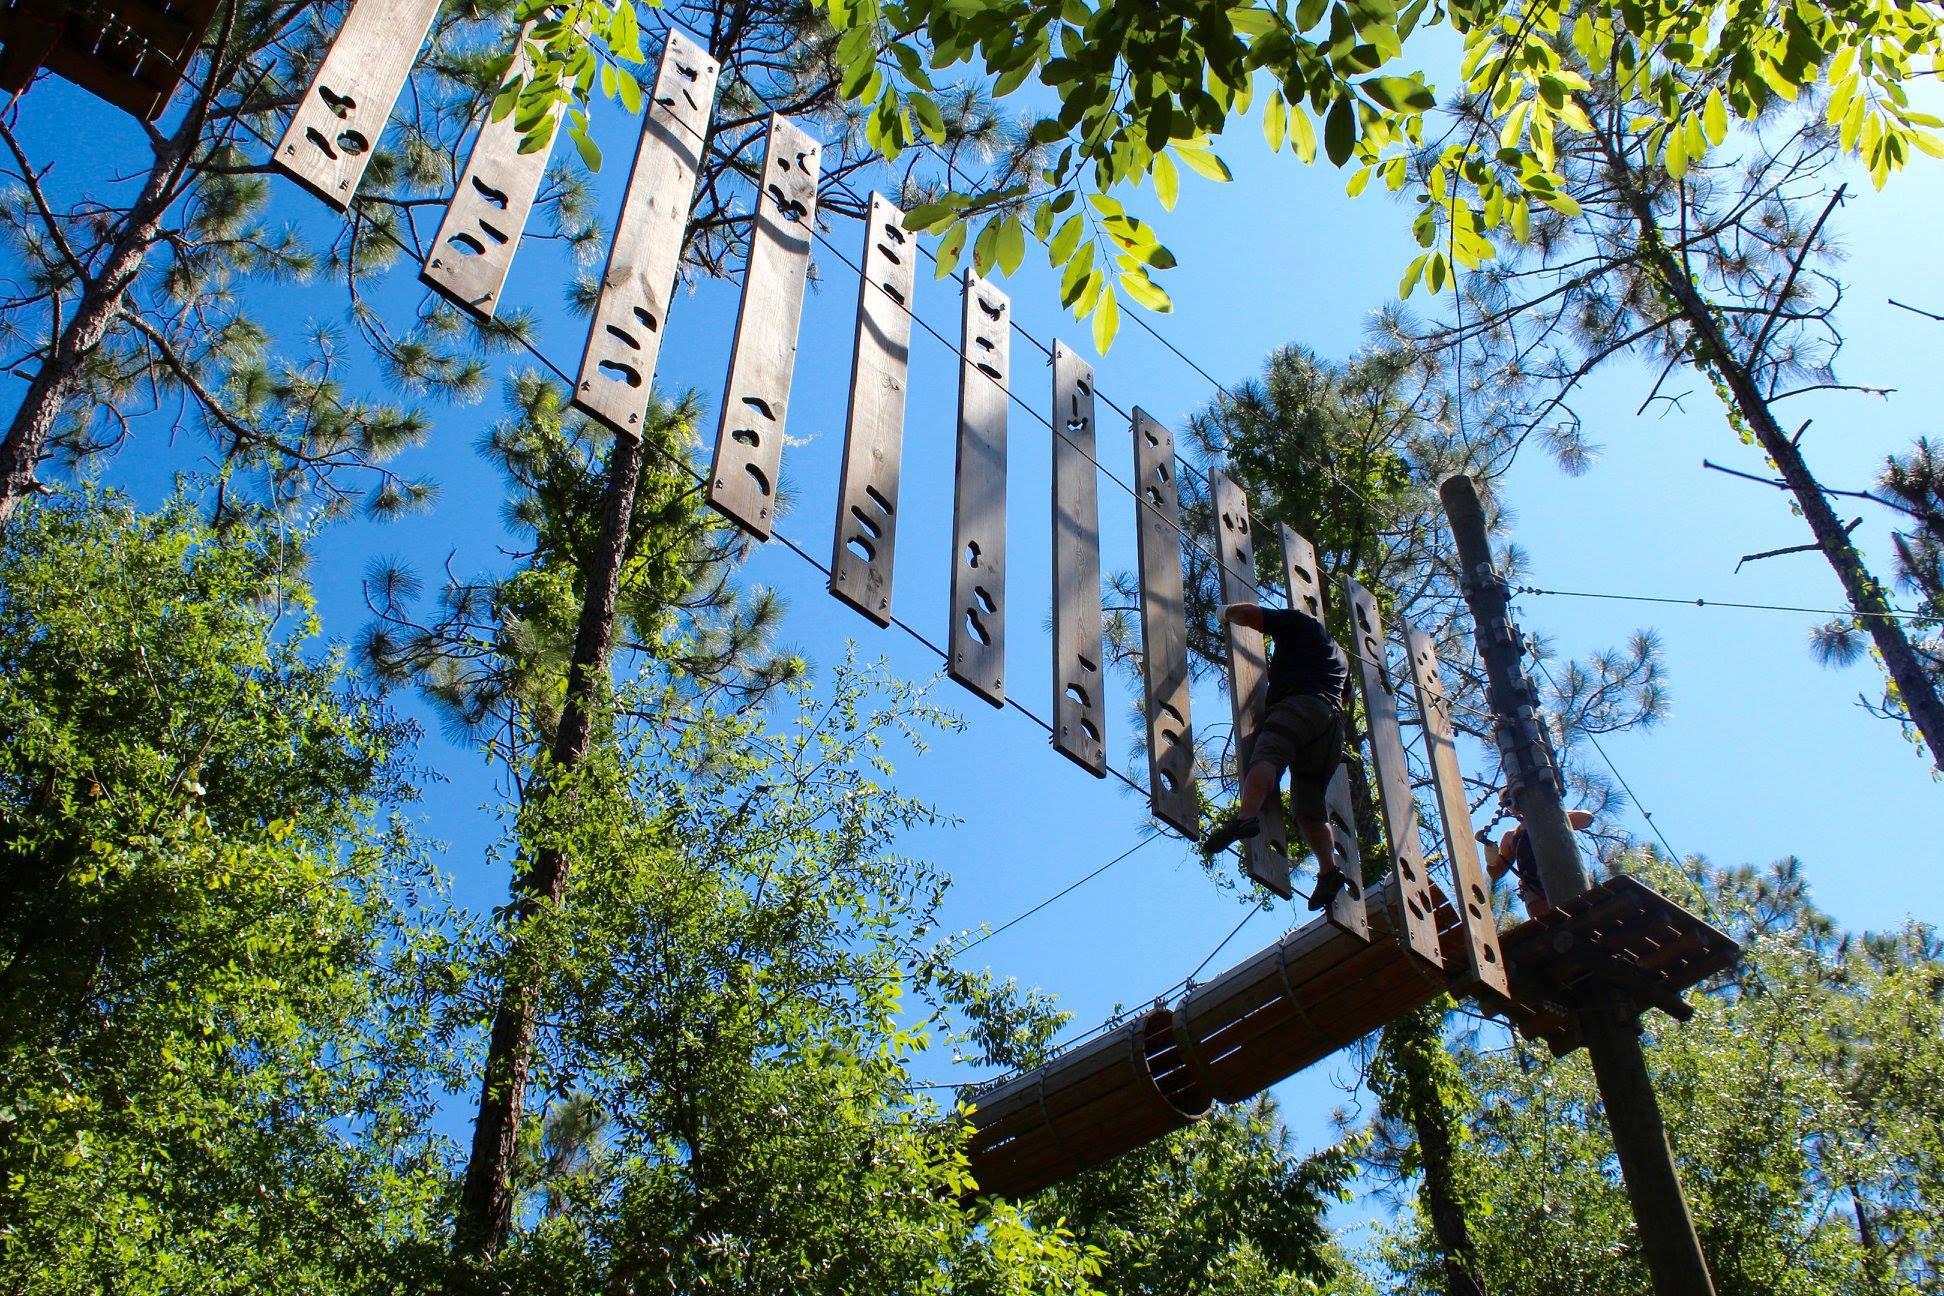 Tree Trek Adventure Park in Orlando